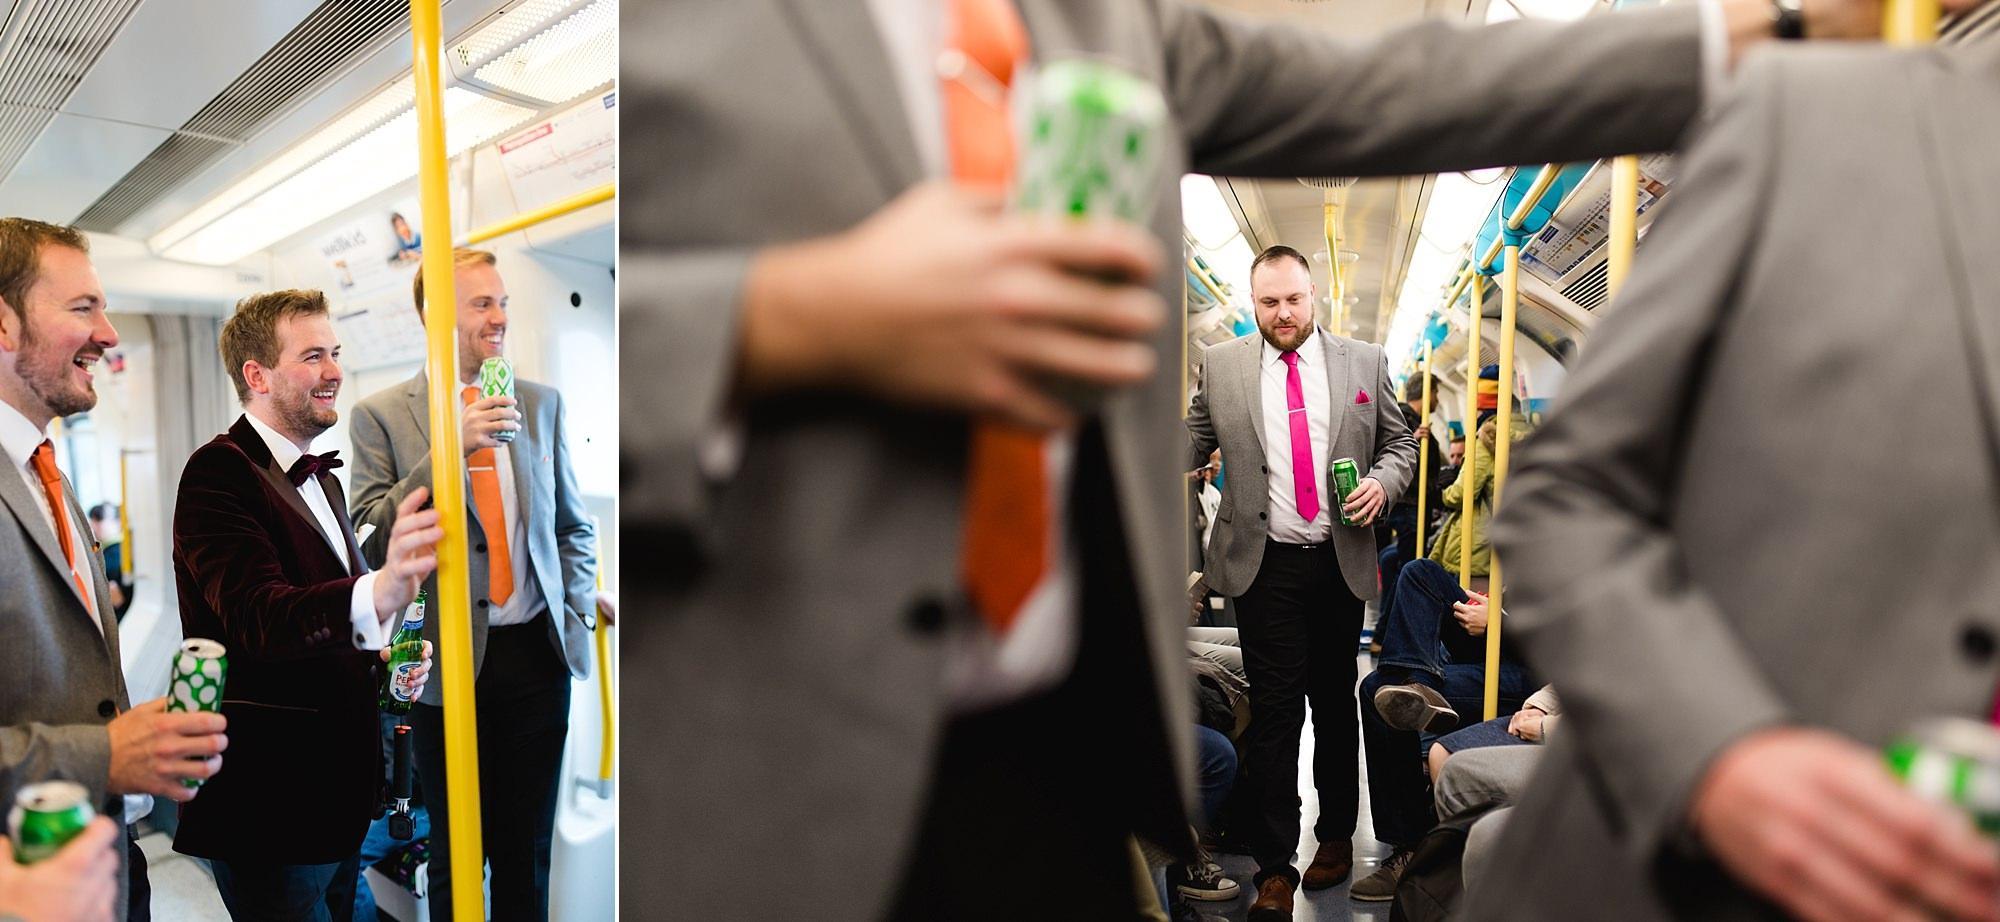 Fun London Wedding portrait of groom and groomsmen on the tube